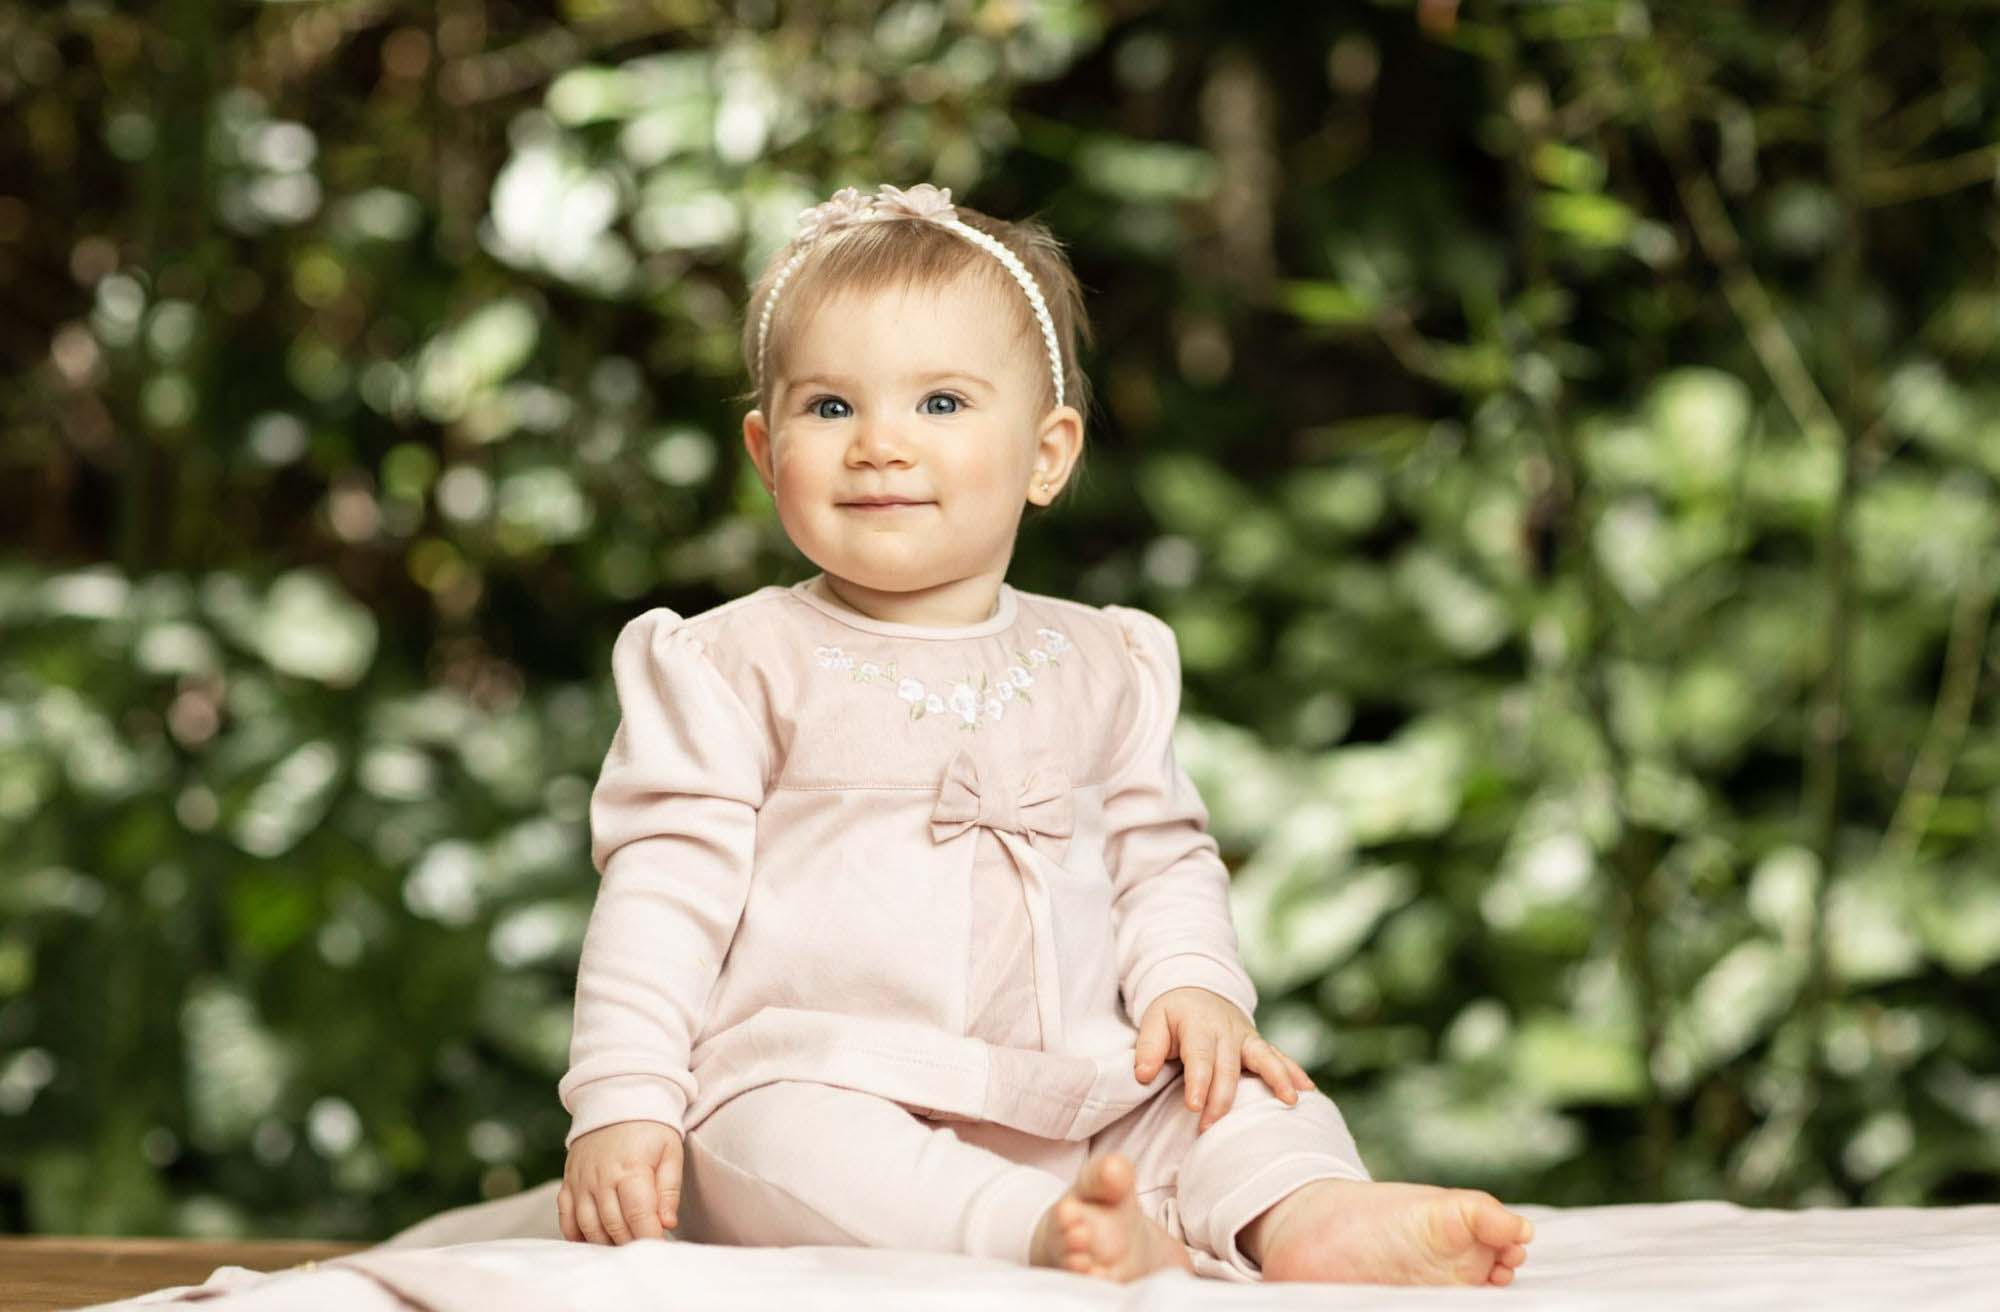 Conjunto Maternidade Feminino Rosa Seco Sem Forro